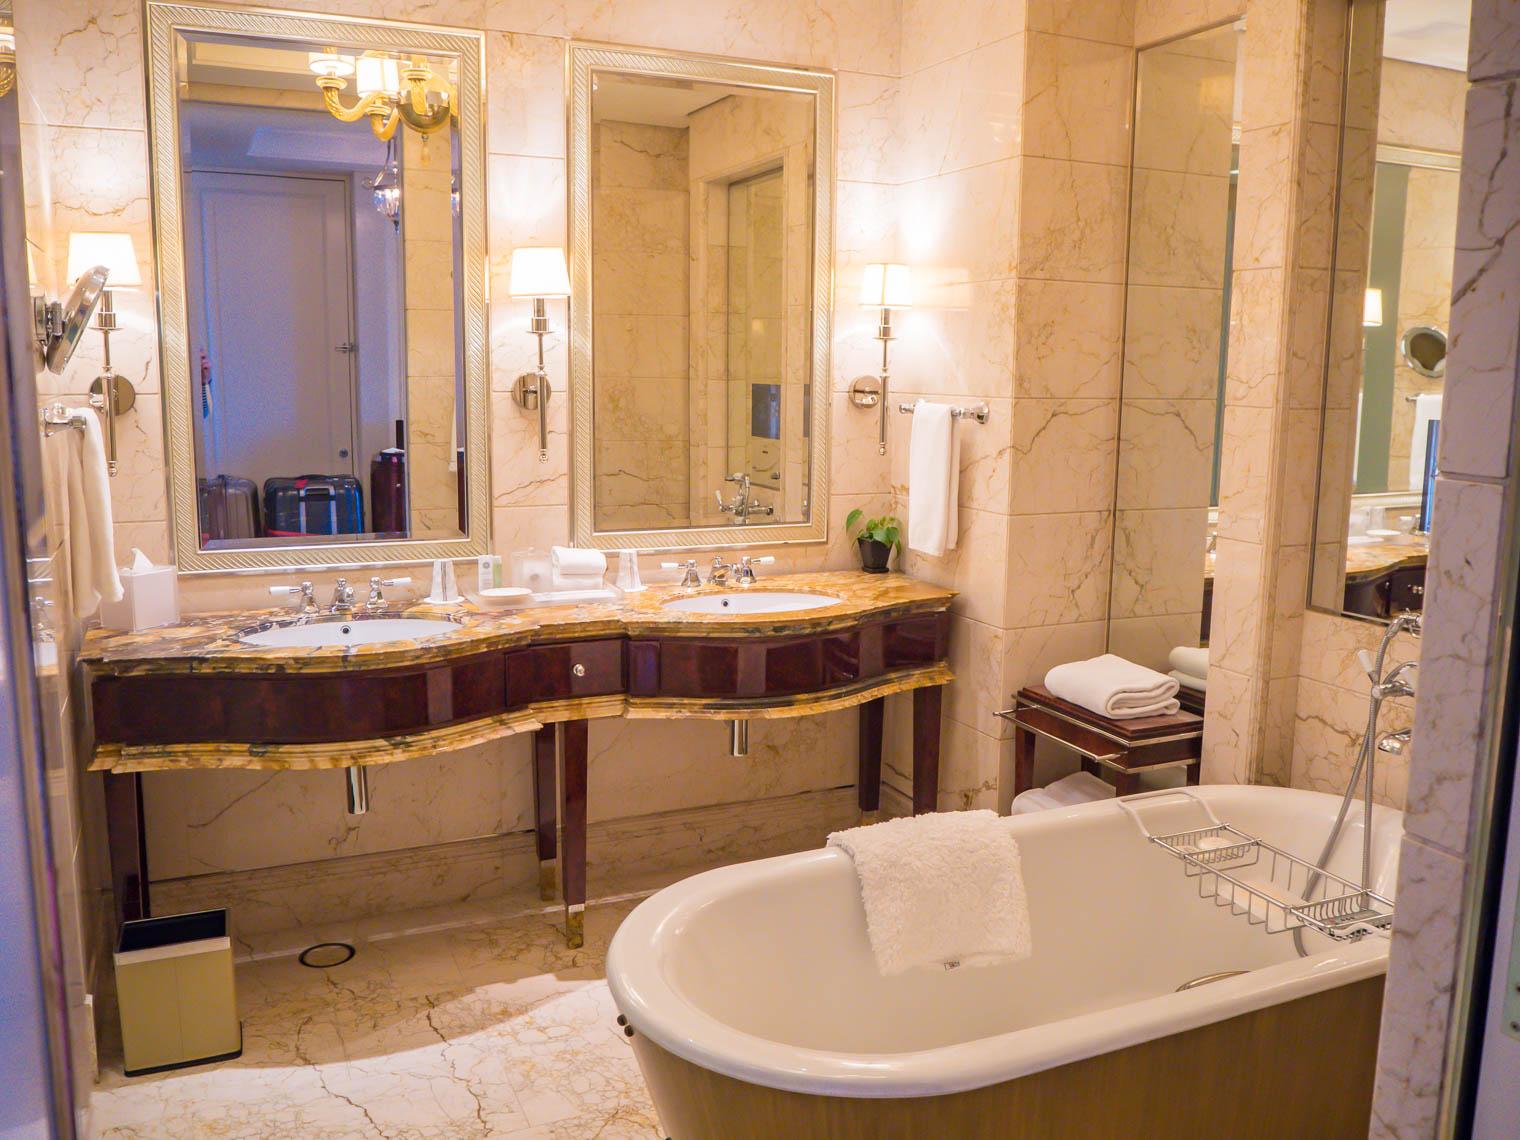 Bathrrom at St Regis hotel Singapore